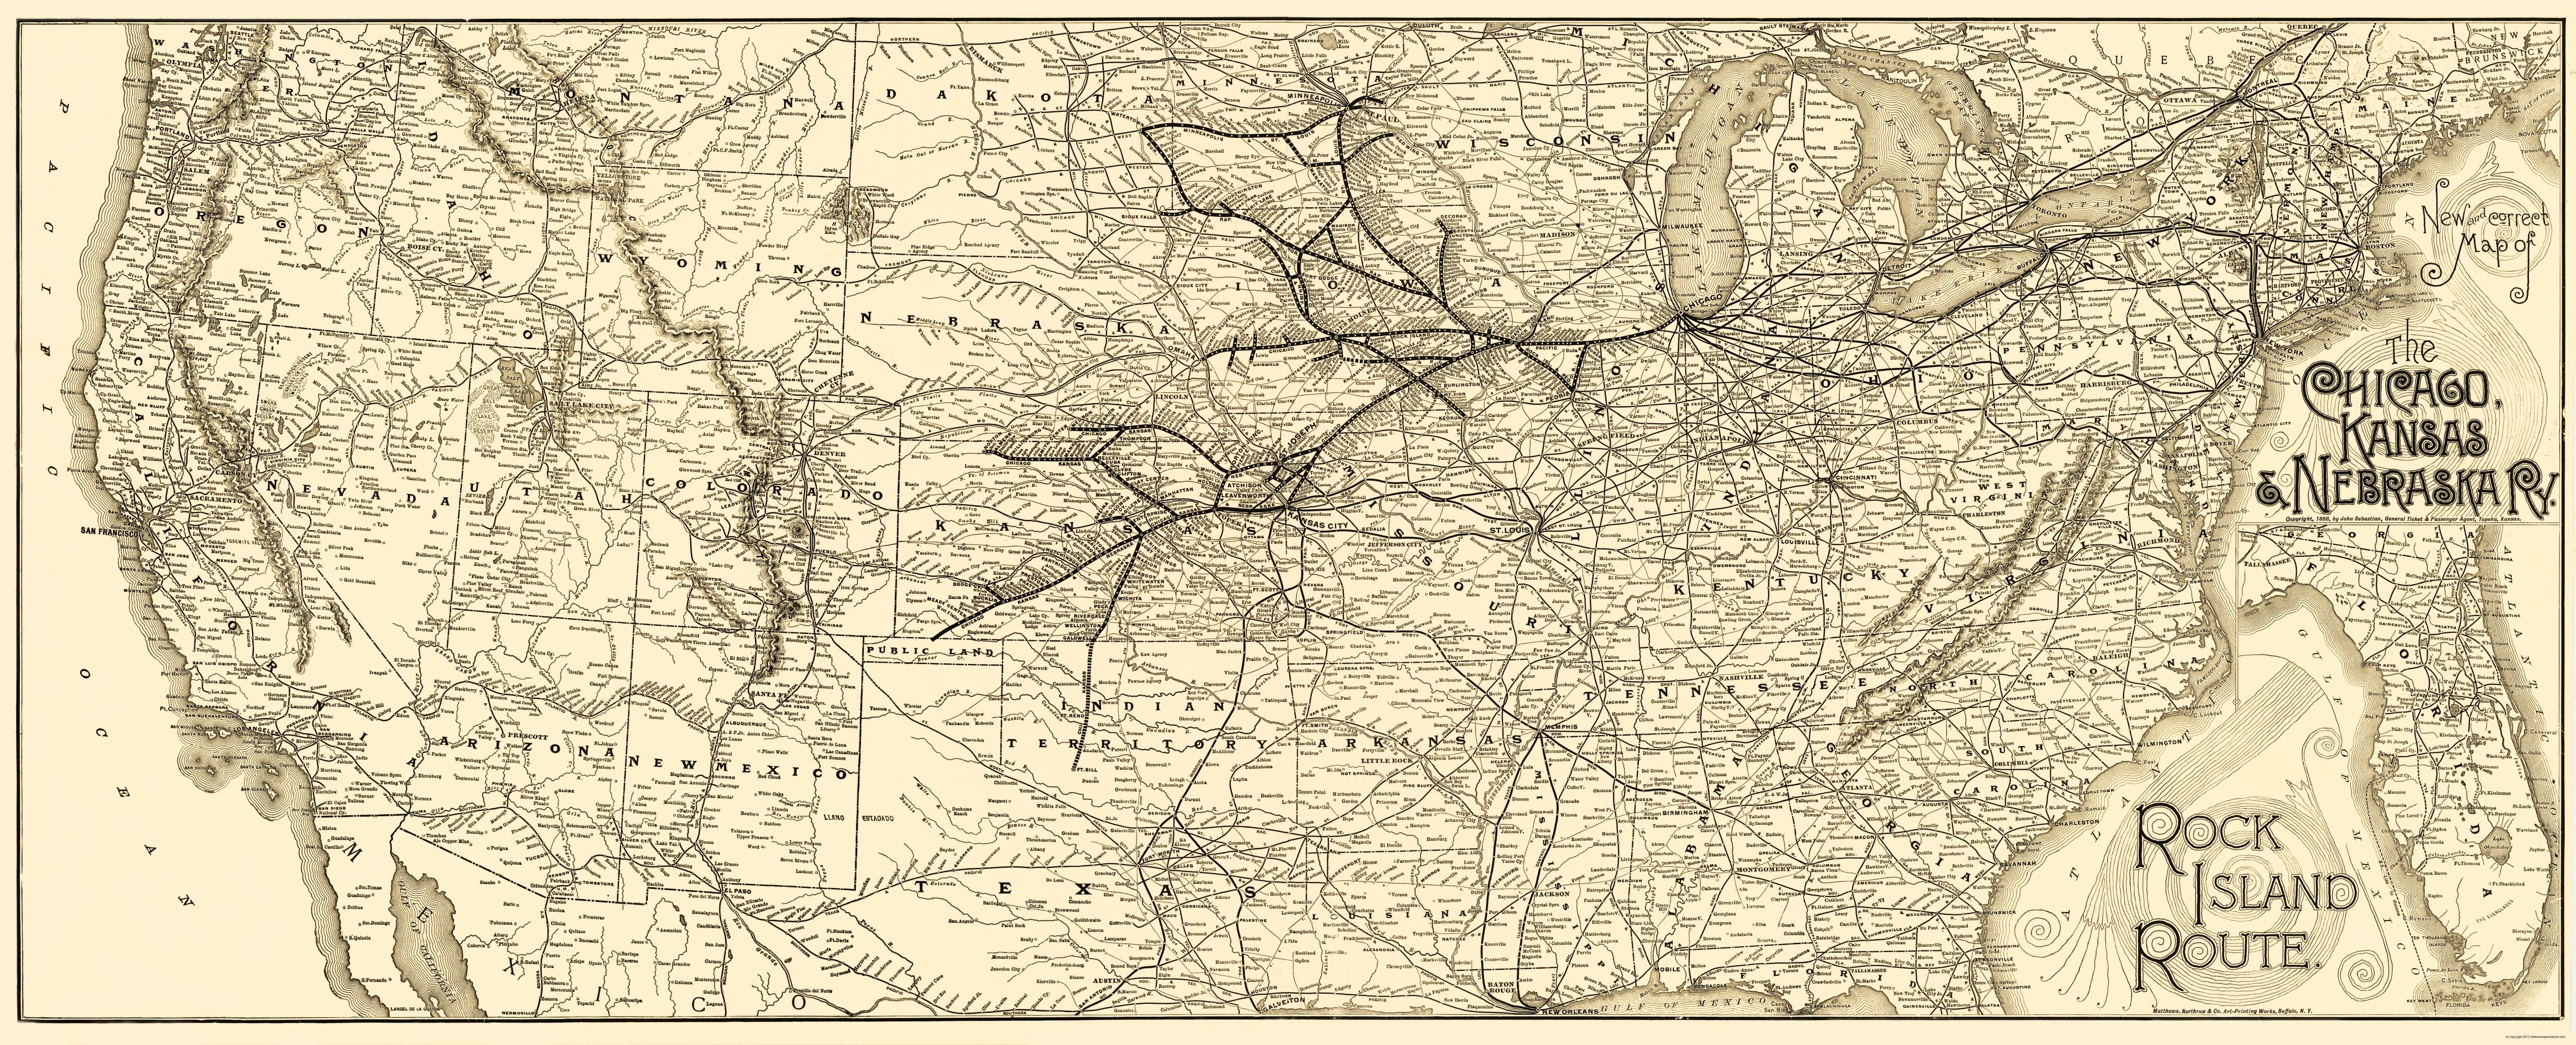 Old Kansas Map.Old Map Chicago Kansas And Nebraska Railroad 1888